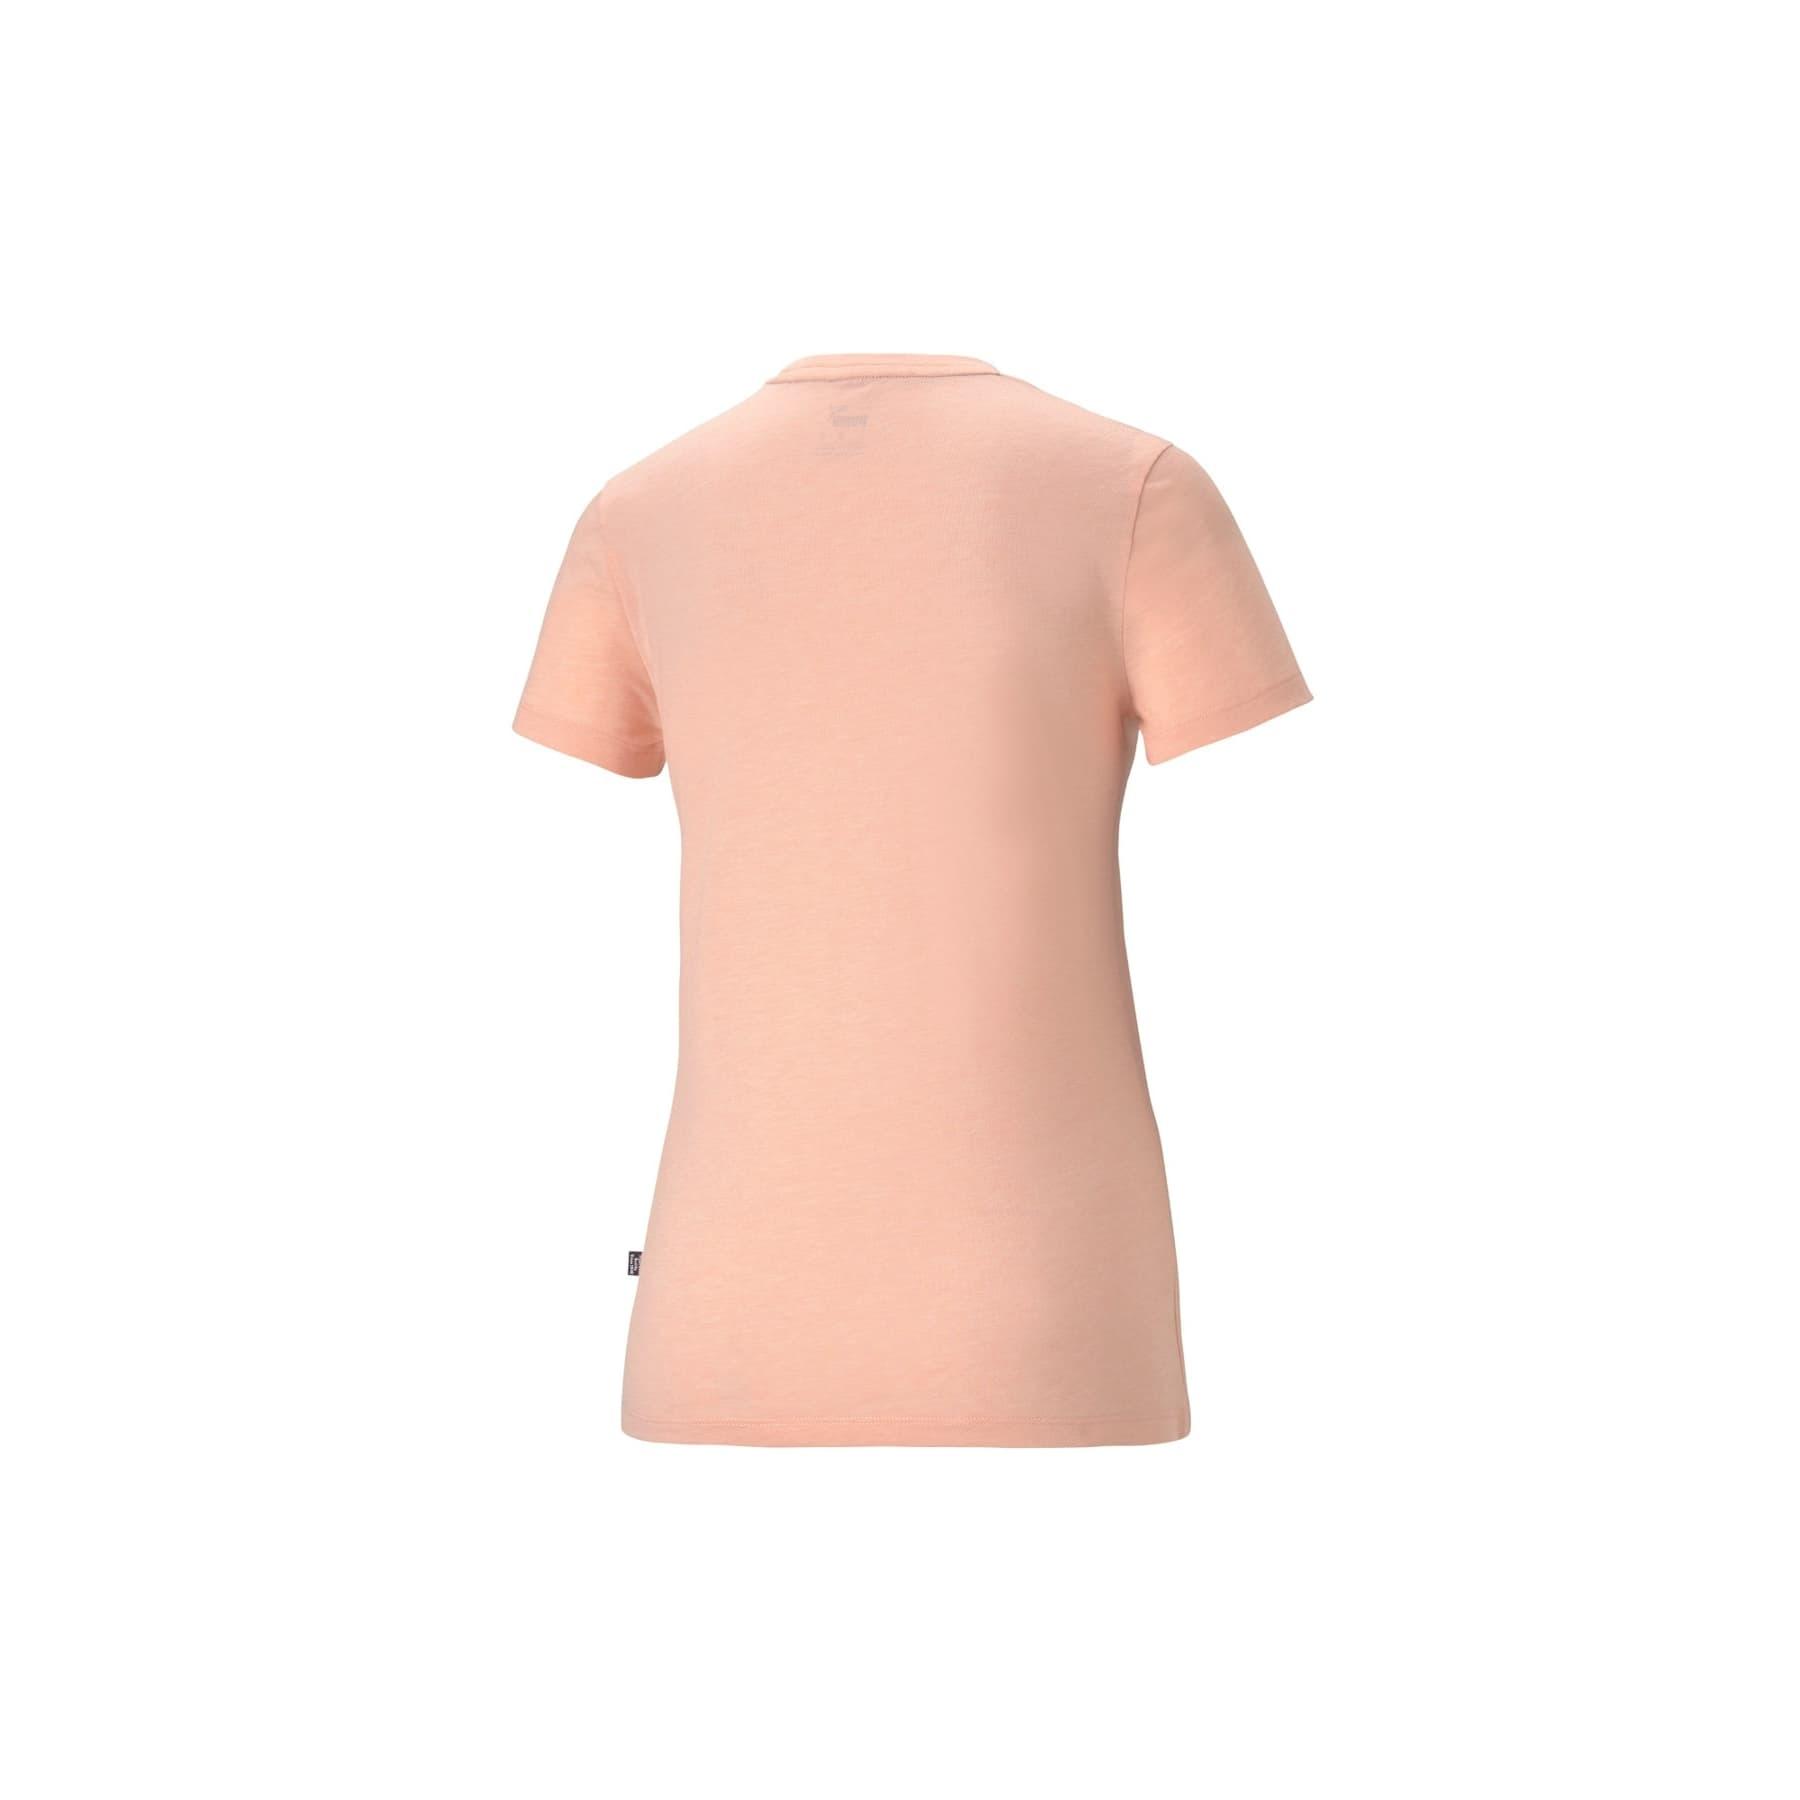 Essential Heather Kadın Pembe Tişört (586876-26)